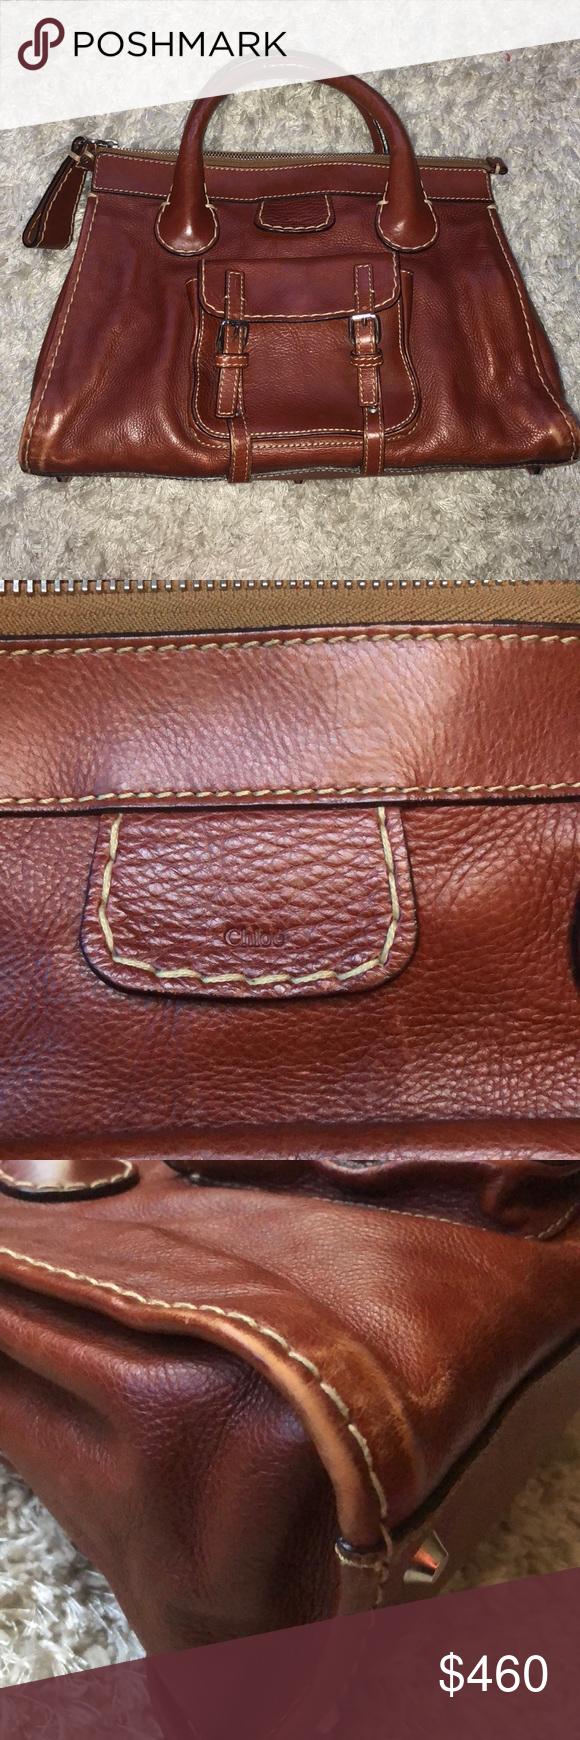 2ebfc53b851 Chloé Chloé Edith bag Very good condition Thick cream stitching Inner  canvas lining dark brown Cognac colour Zipper enclosure Interior pockets  Front pockets ...